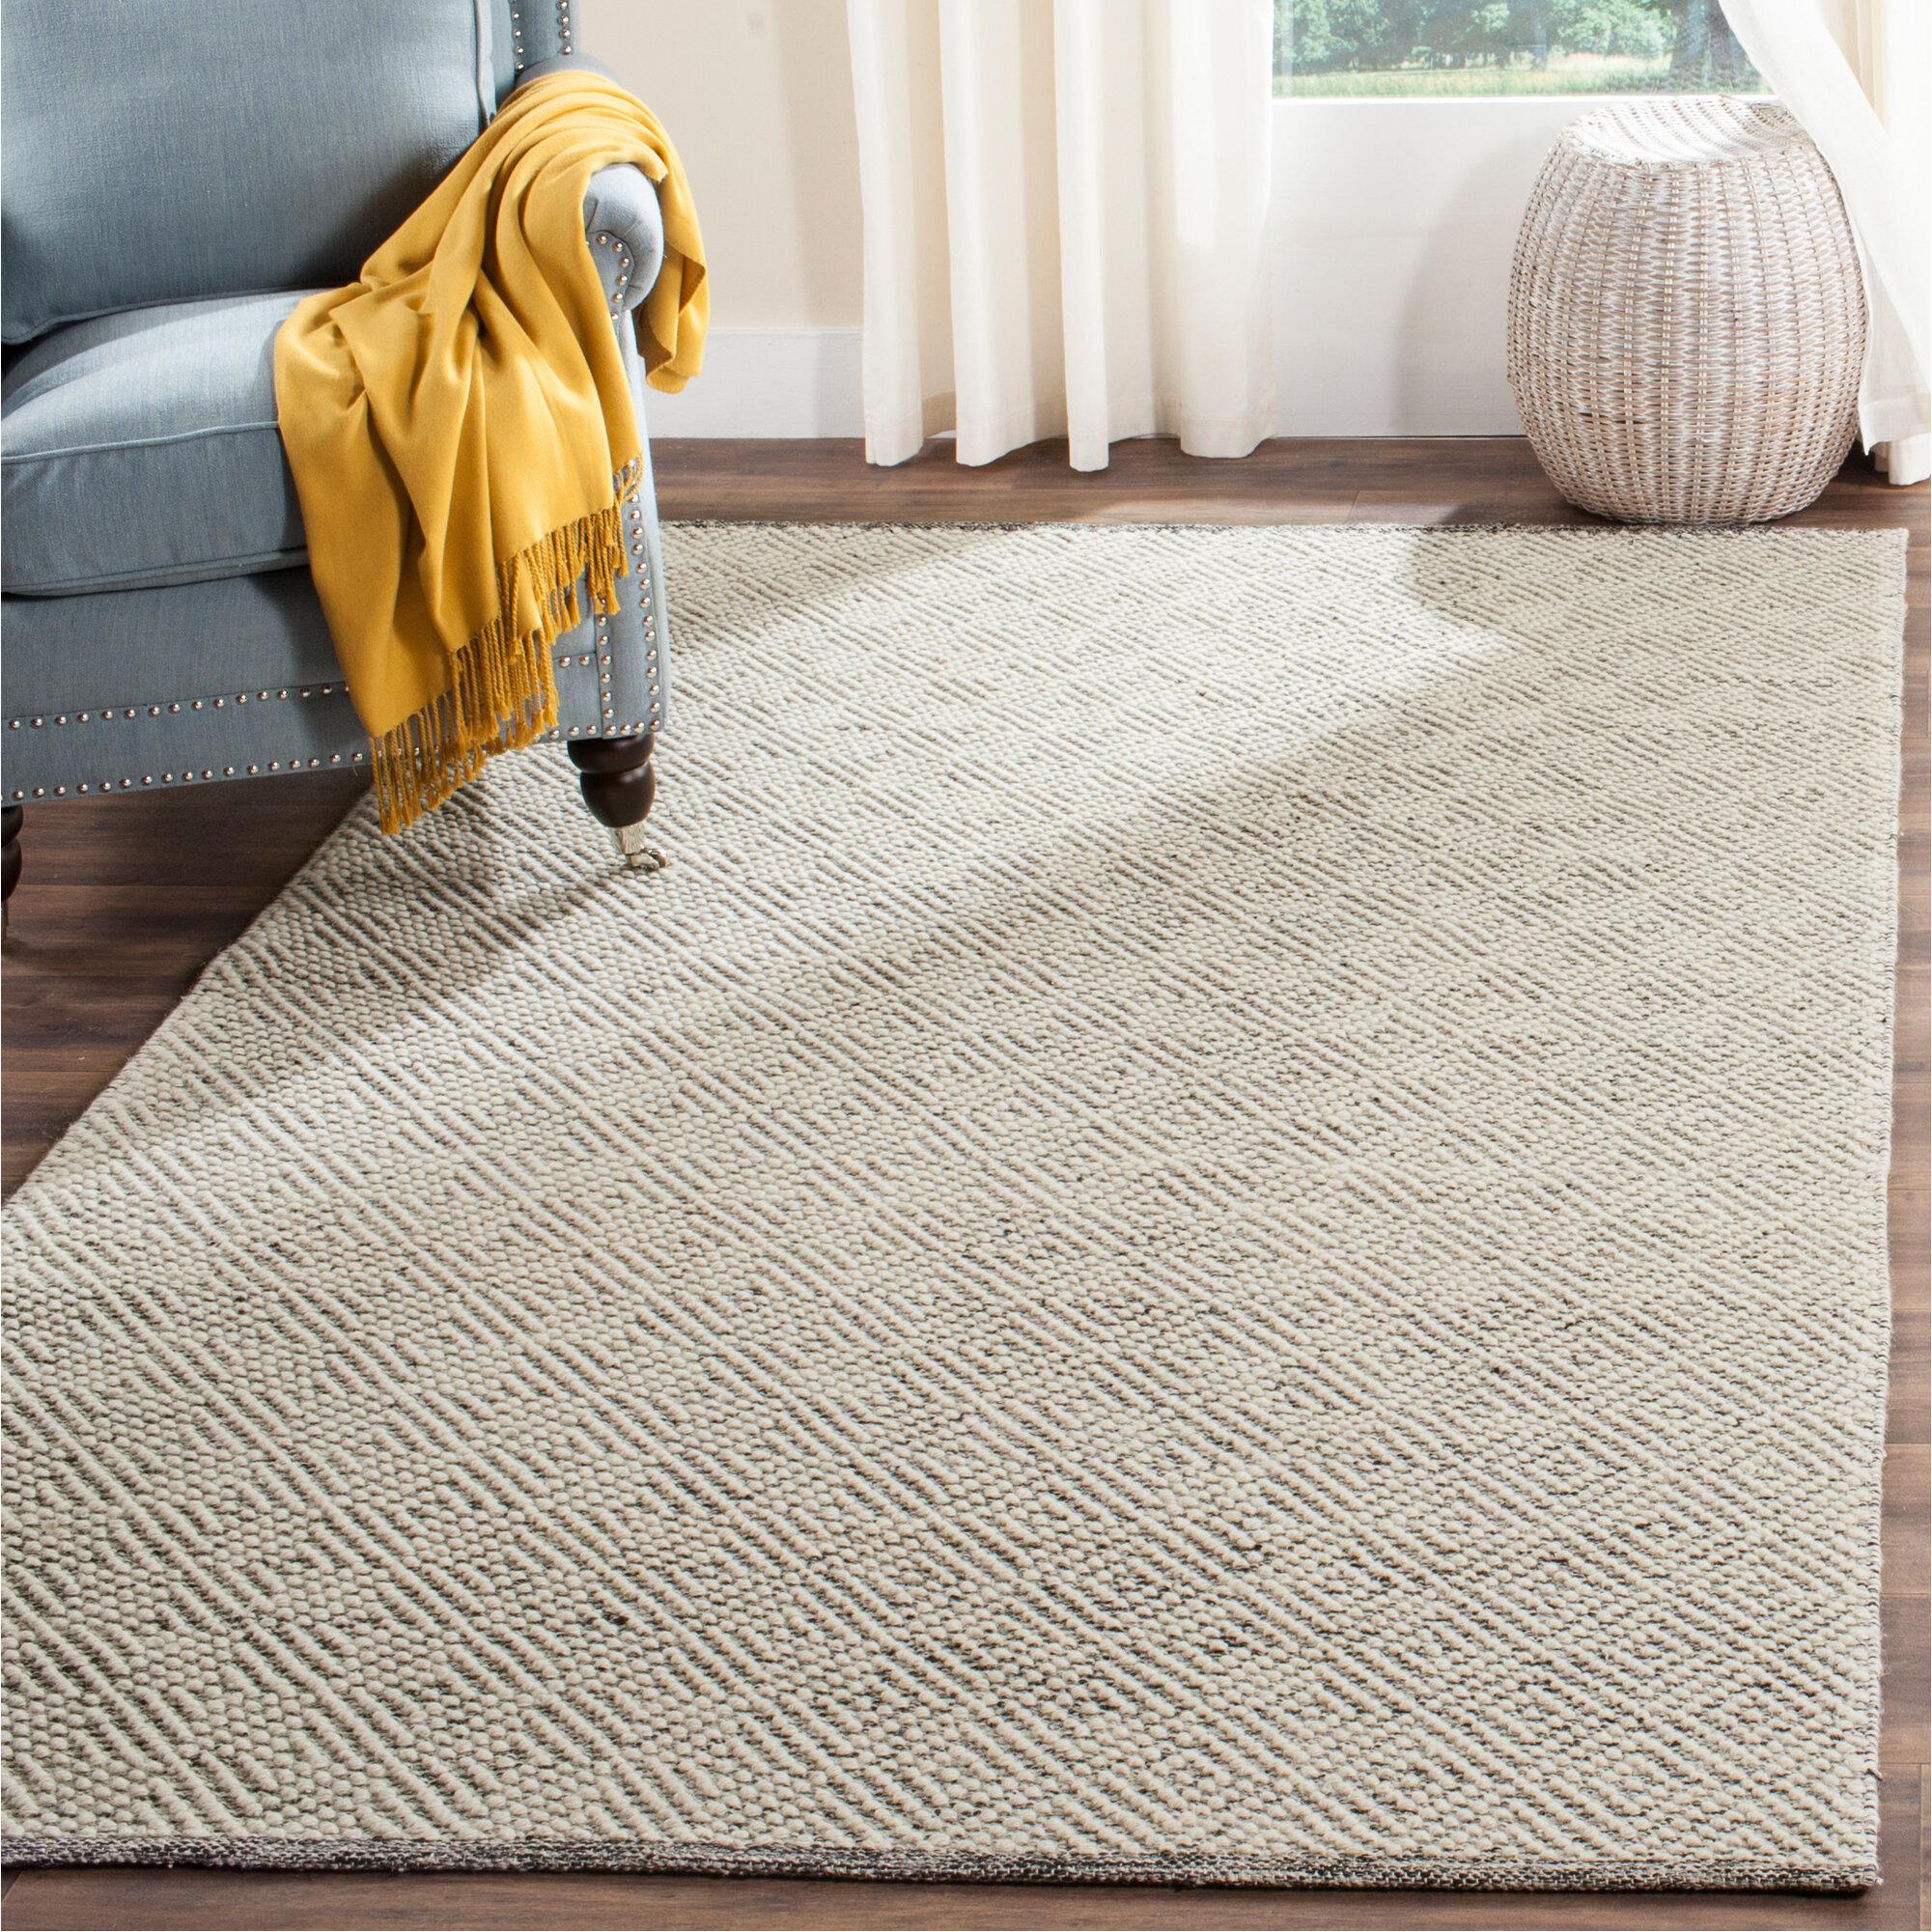 Dakota Fields Alayna Hand Tufted Wool Cotton Ivory Light Grey Area Rug Reviews Wayfair Ca